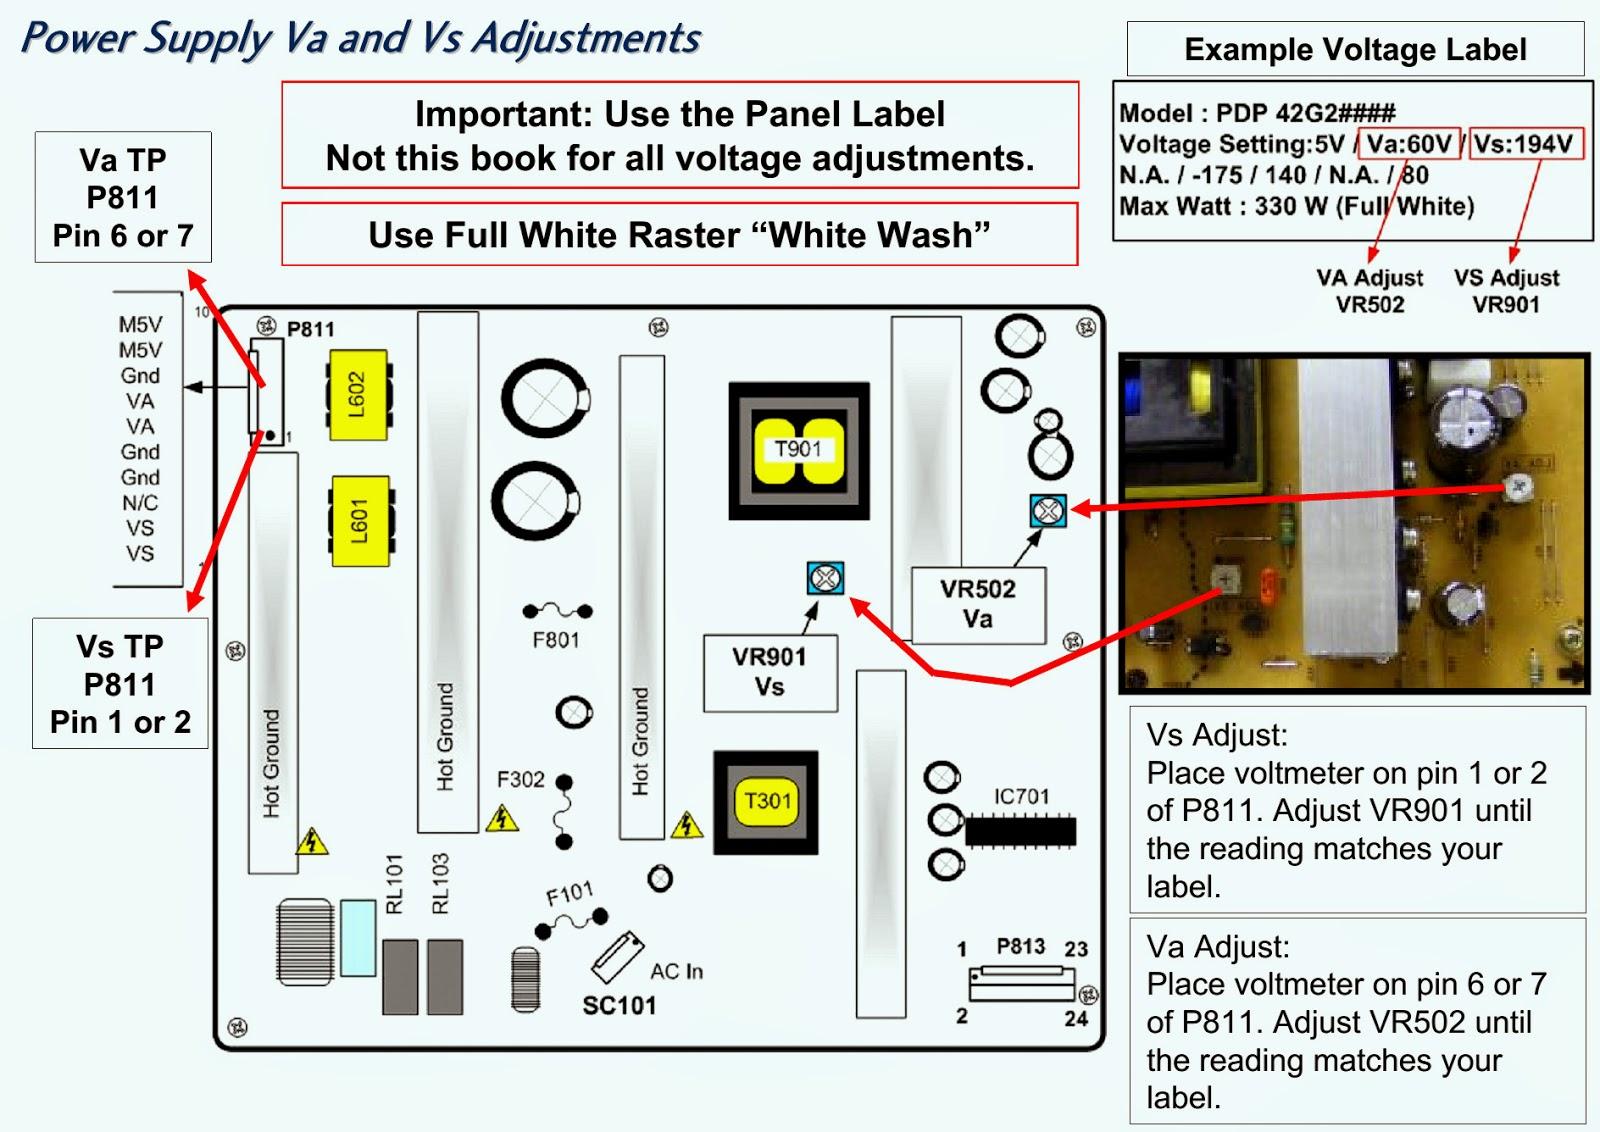 LG50PQ30 plasma TV POWER SUPPLY BOARD [SMPS] CHECKING PROCEDURE ...